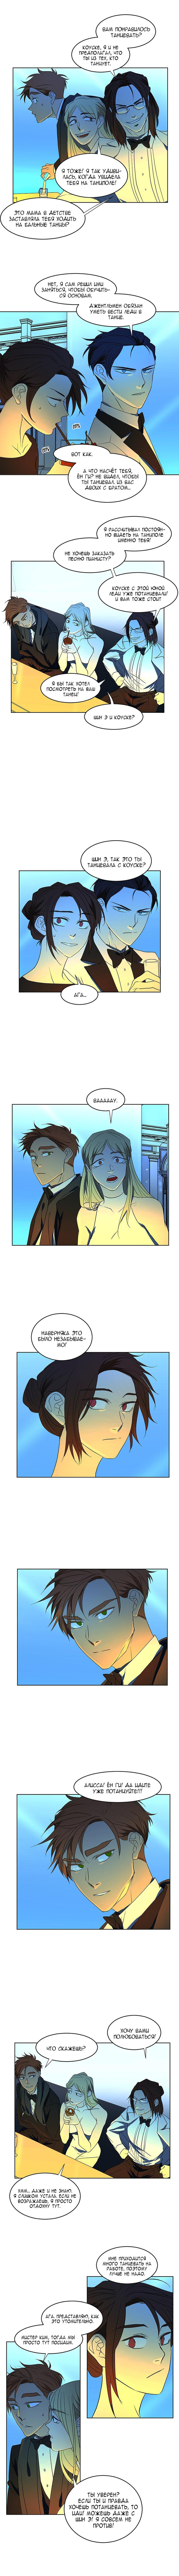 https://r1.ninemanga.com/comics/pic2/27/32027/415457/1530933084374.jpg Page 3